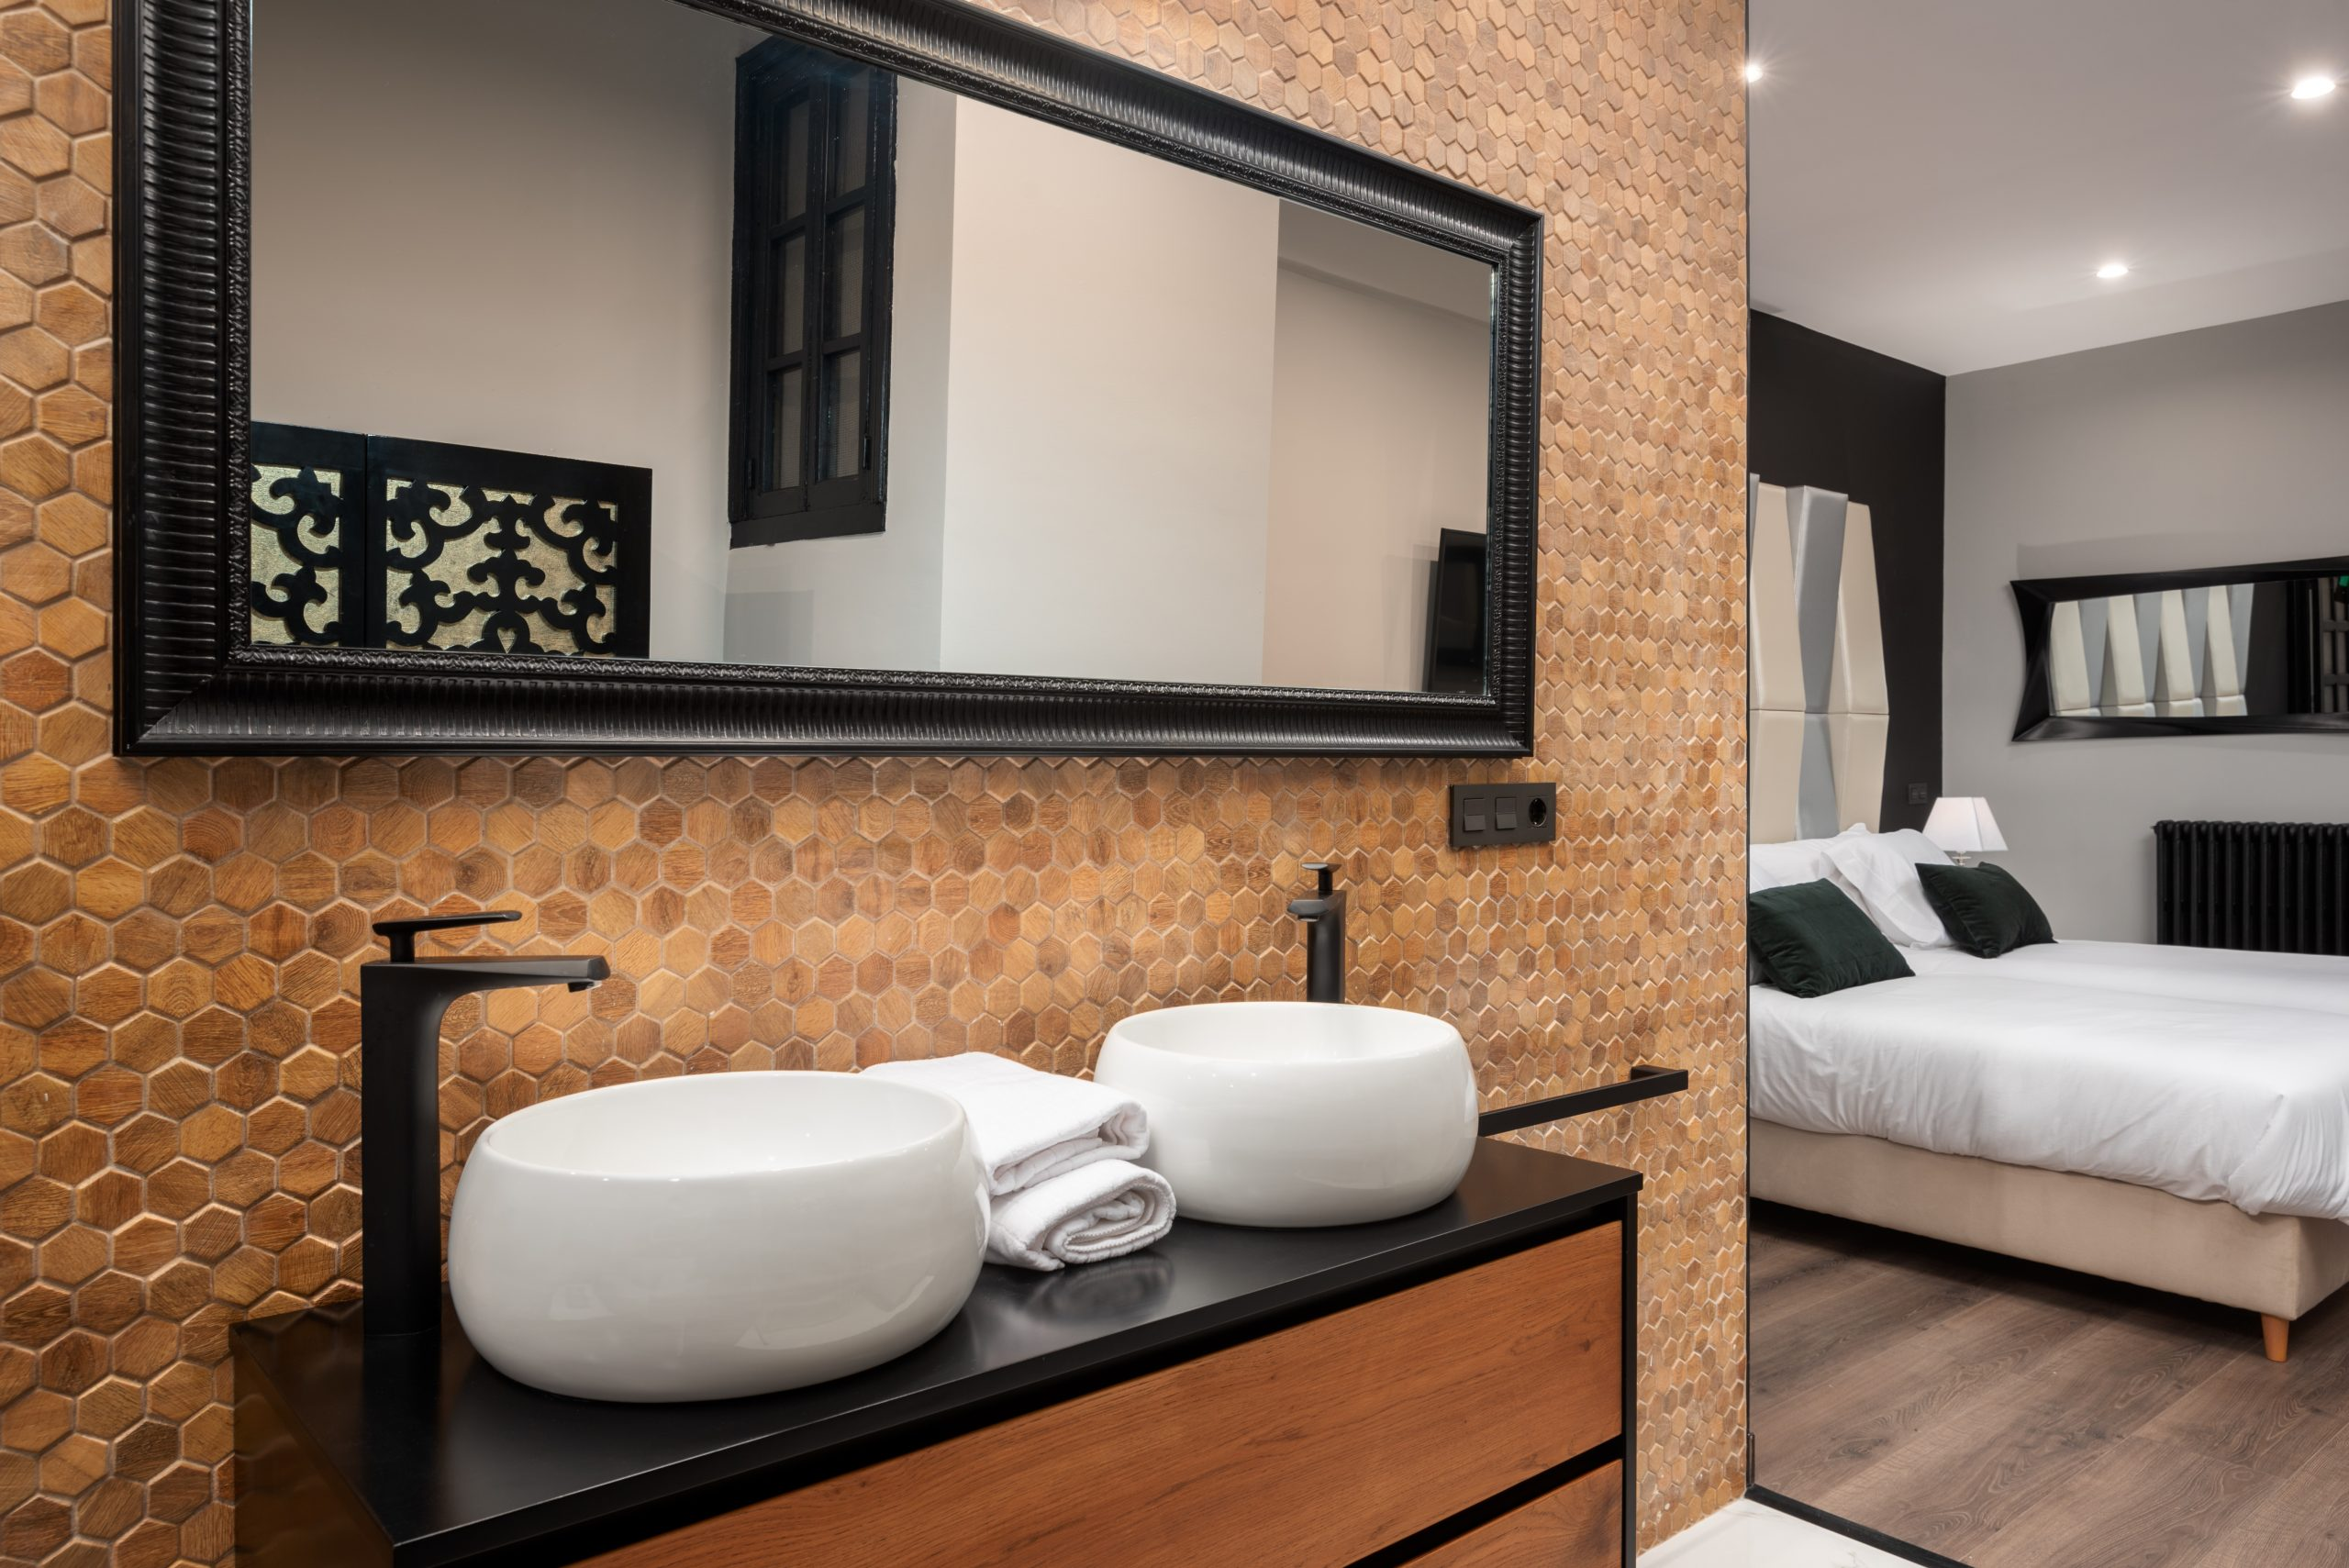 Apartamento-Suite-Deluxe-63-Oviedo-1907-05